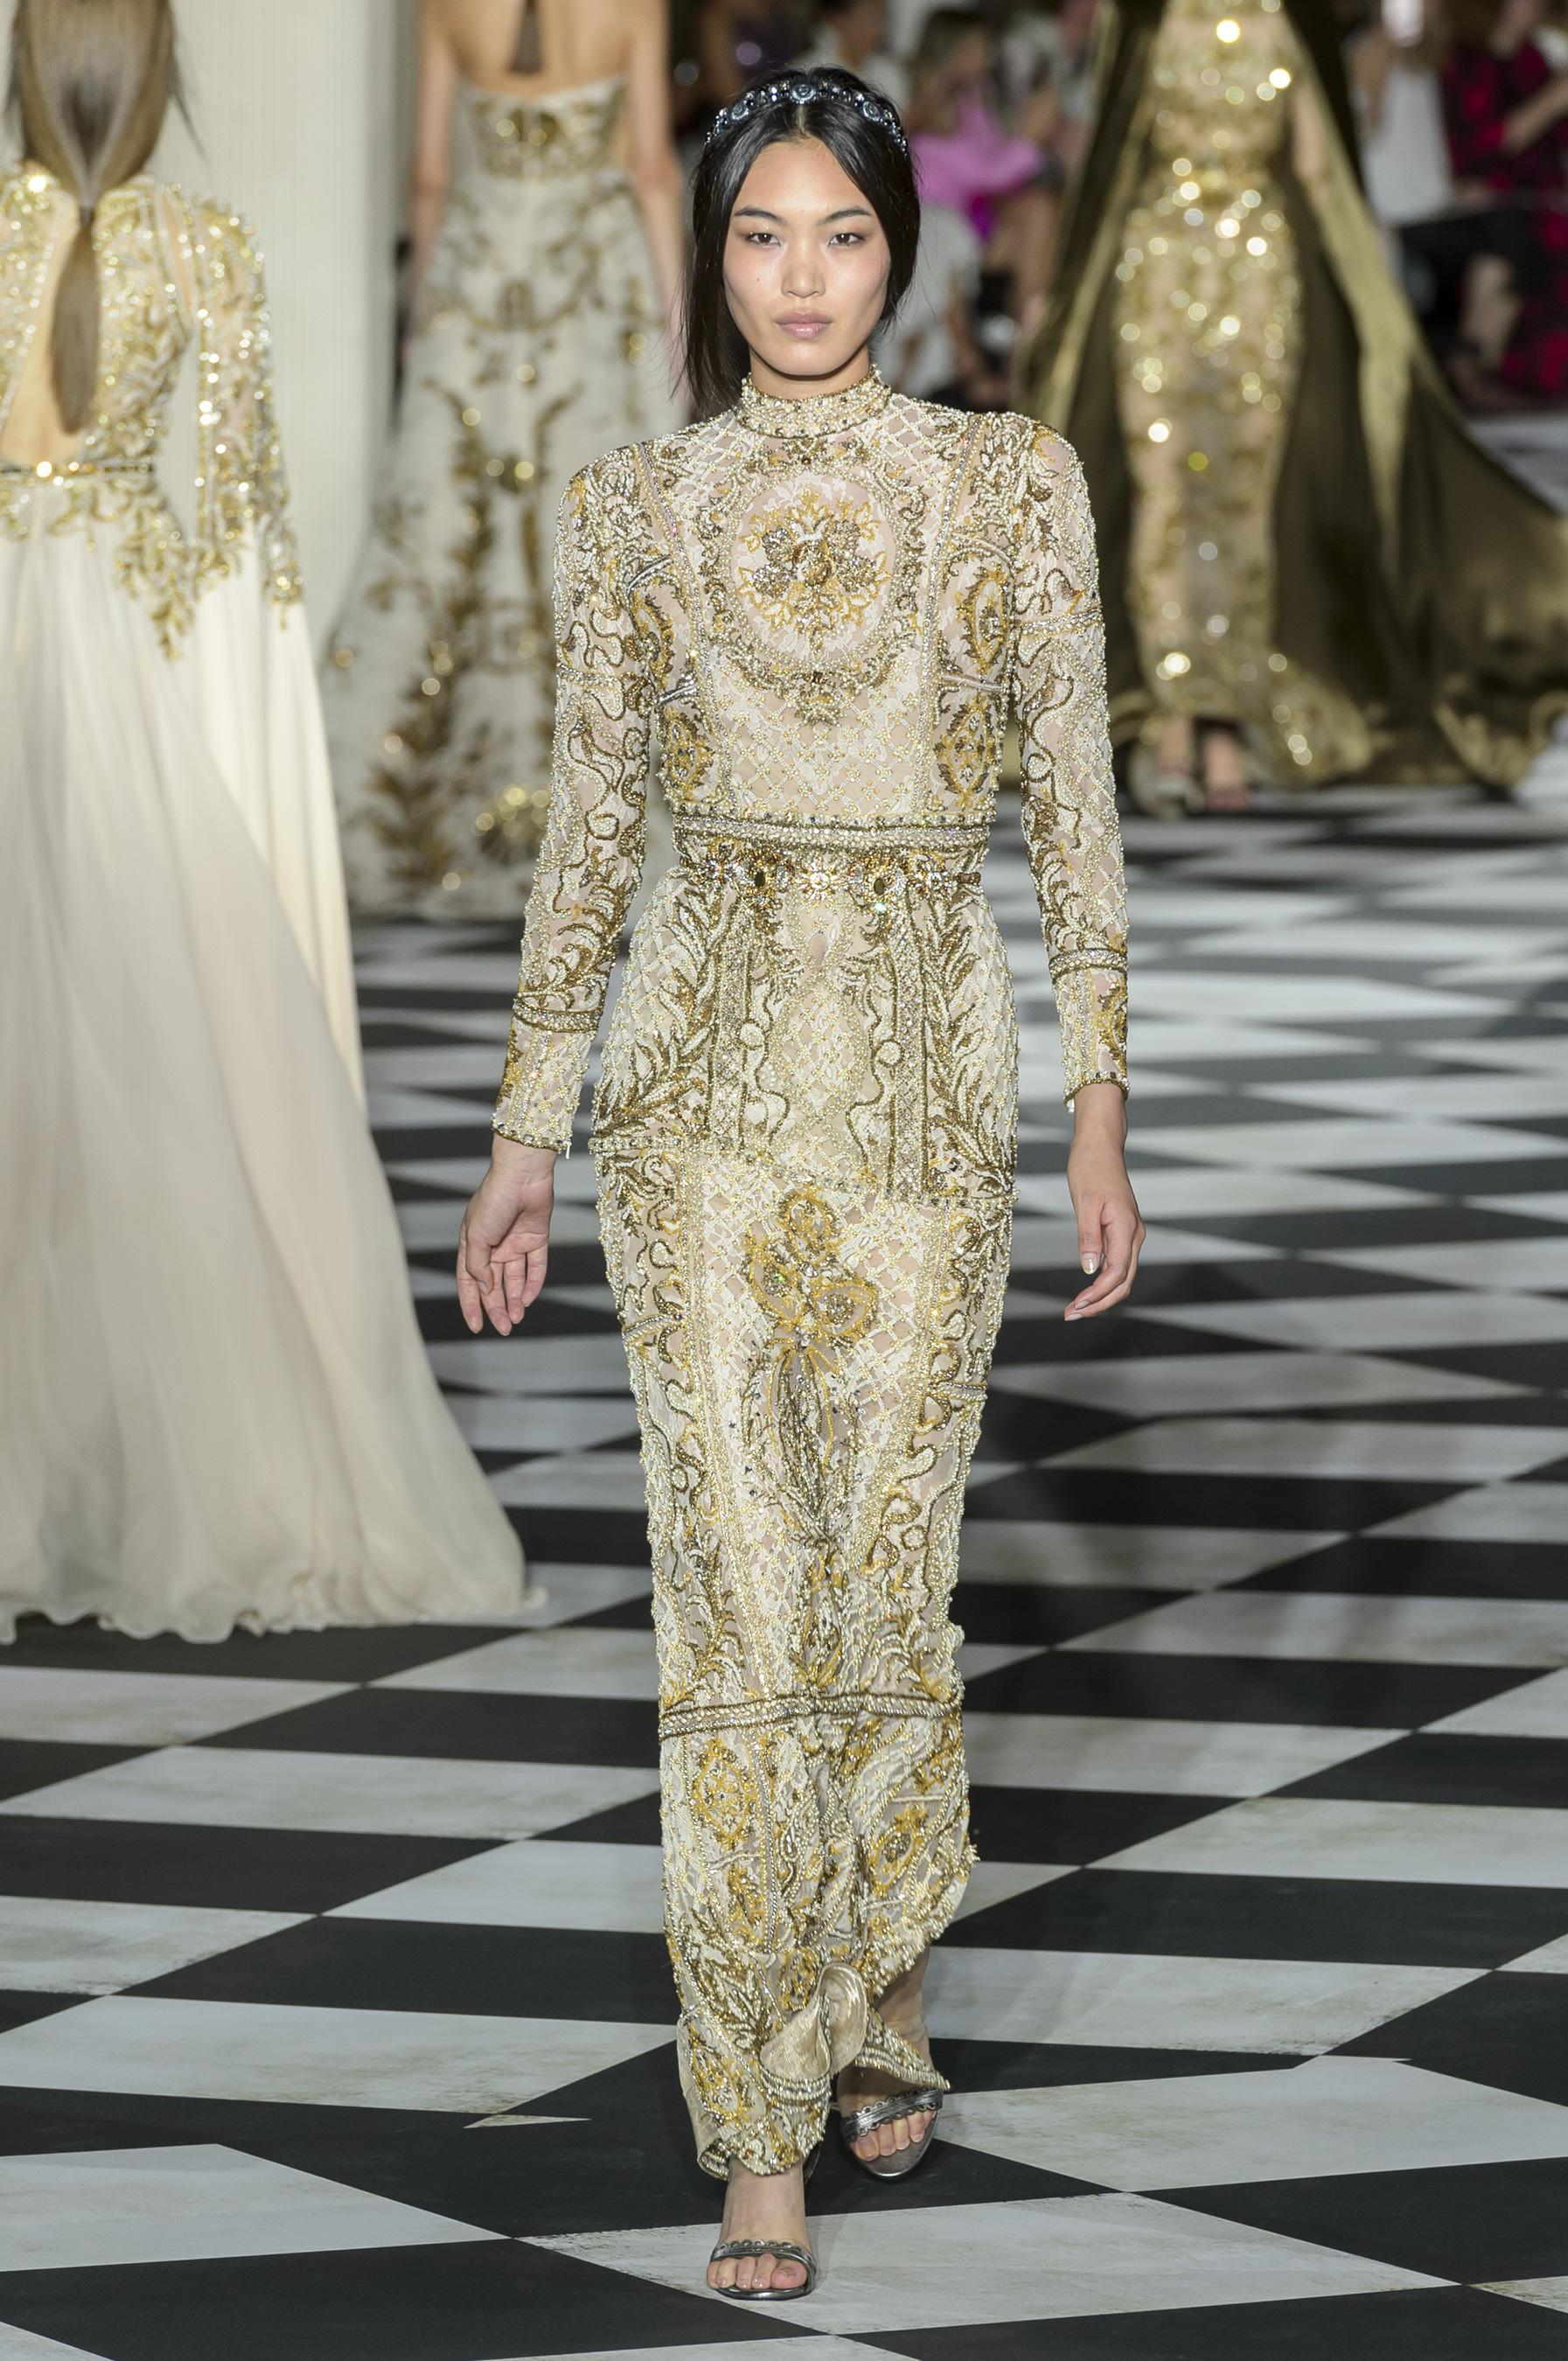 Défilé Zuhair Murad Automne Hiver 2018 2019 Couture Madame Figaro